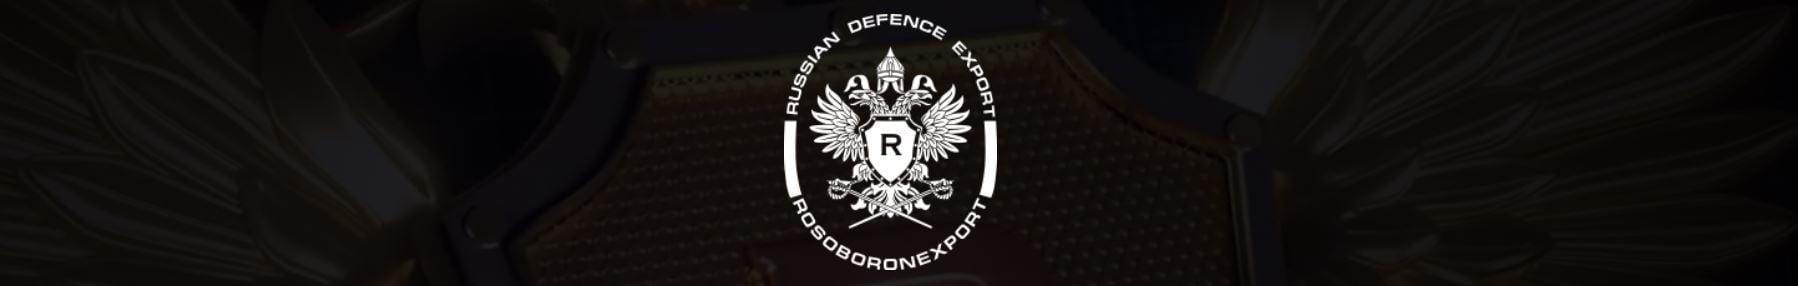 Rosonboronexport